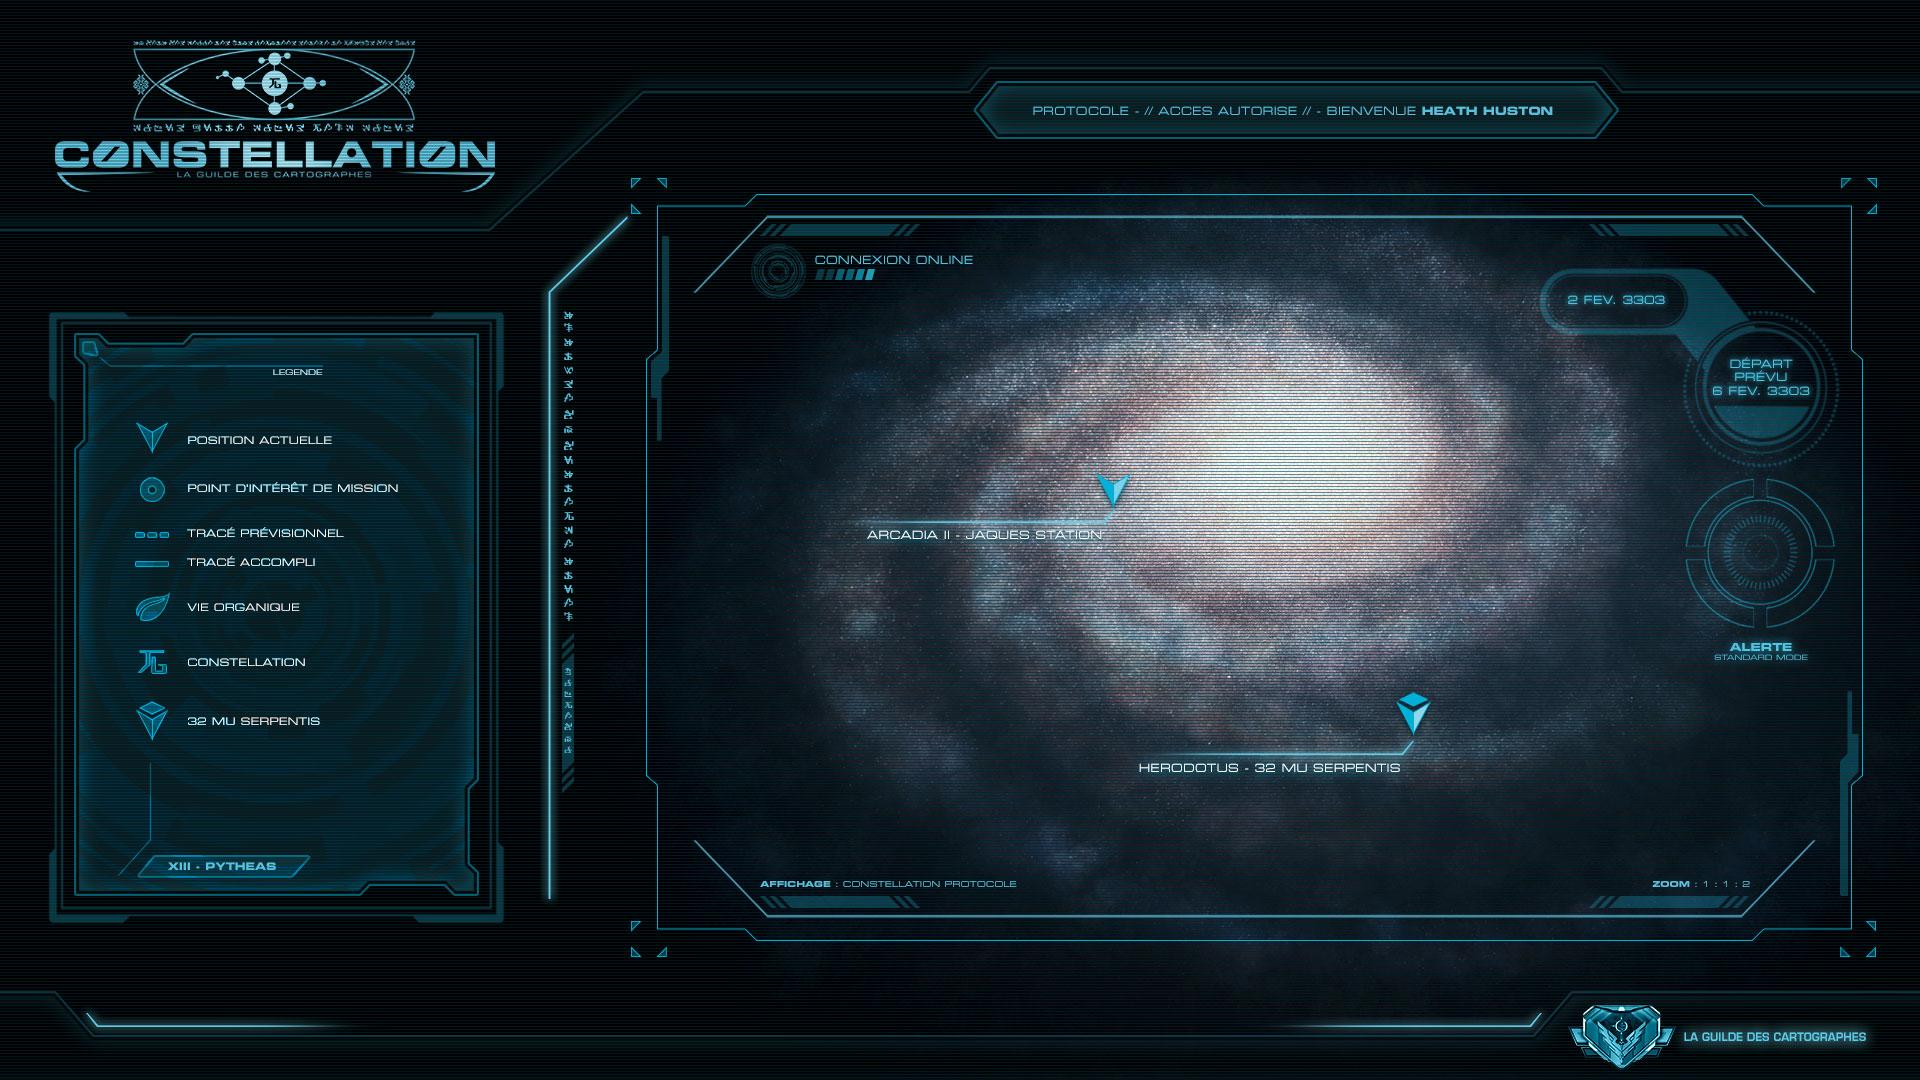 Constellation_mep_carte_galaxie